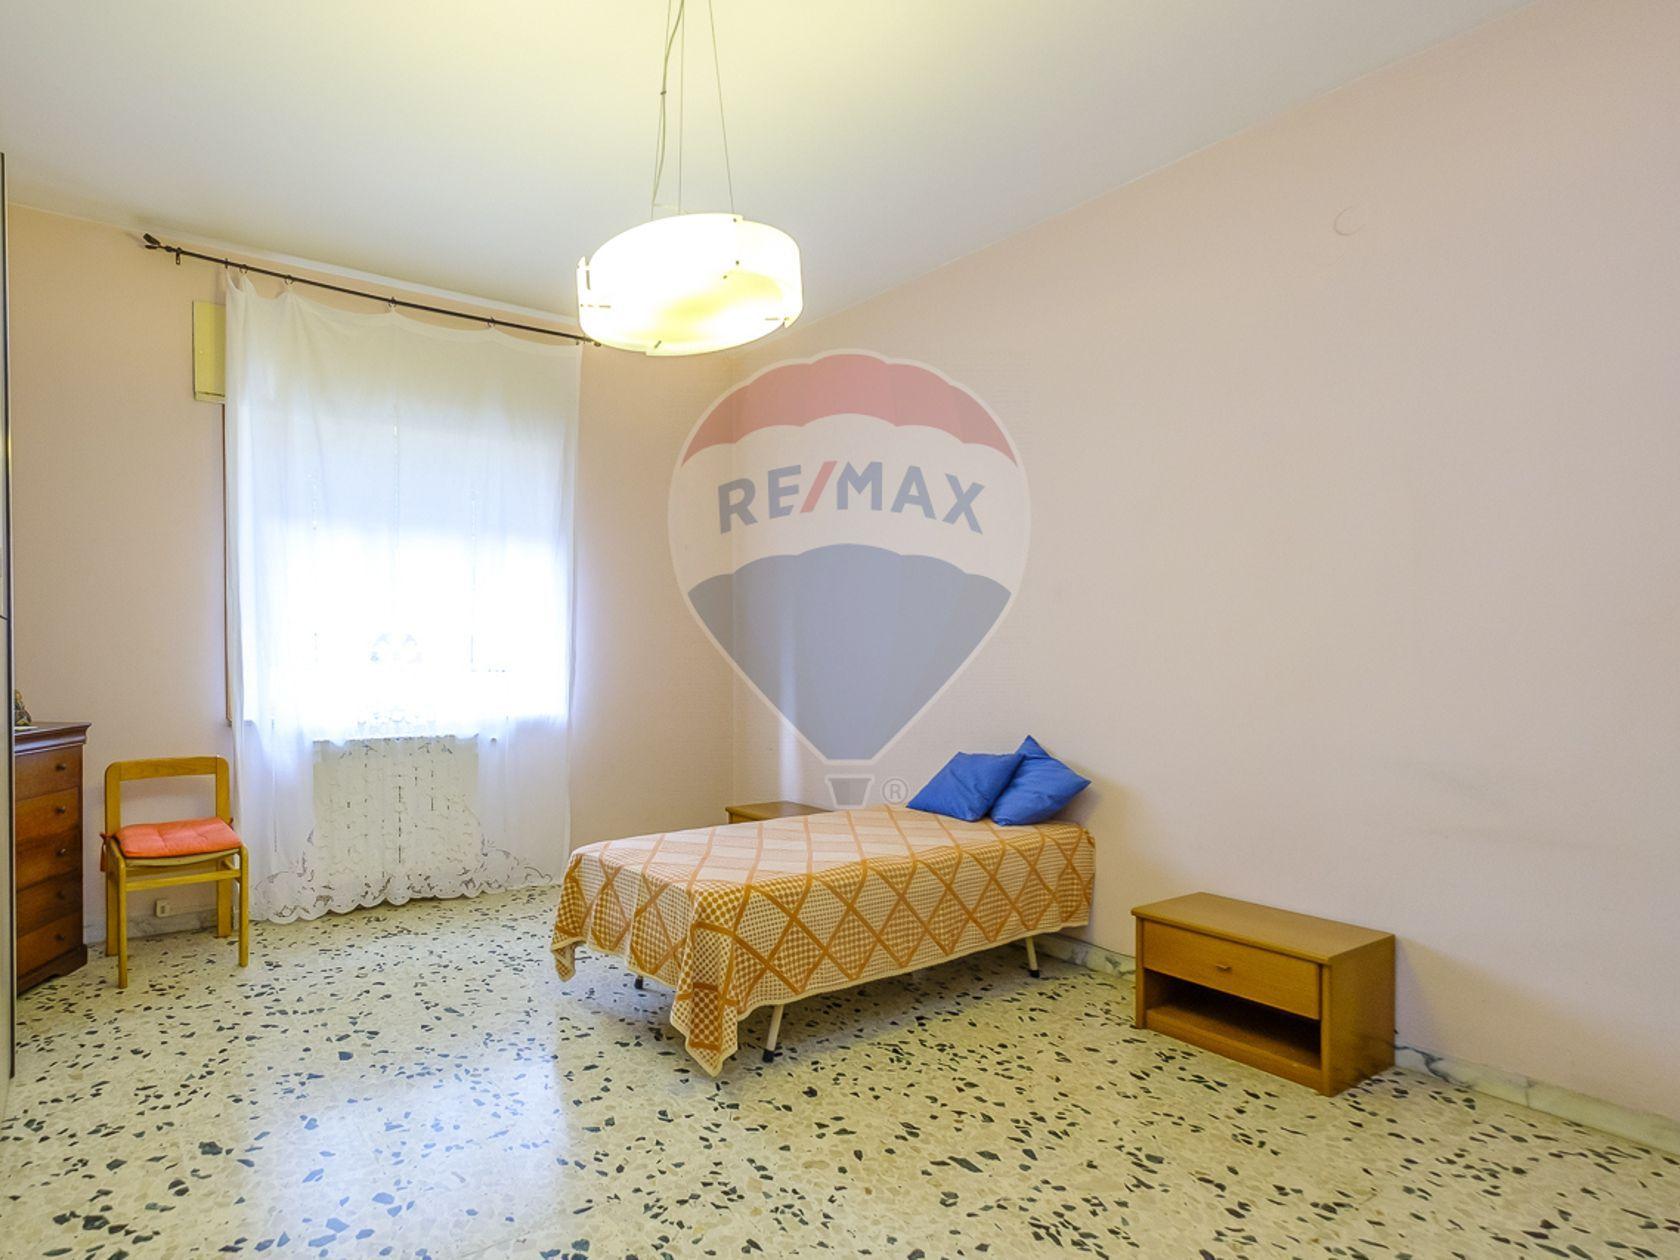 Appartamento Siracusa- Scala Greca S. Panagia Teracati Zecchino, Siracusa, SR Vendita - Foto 12